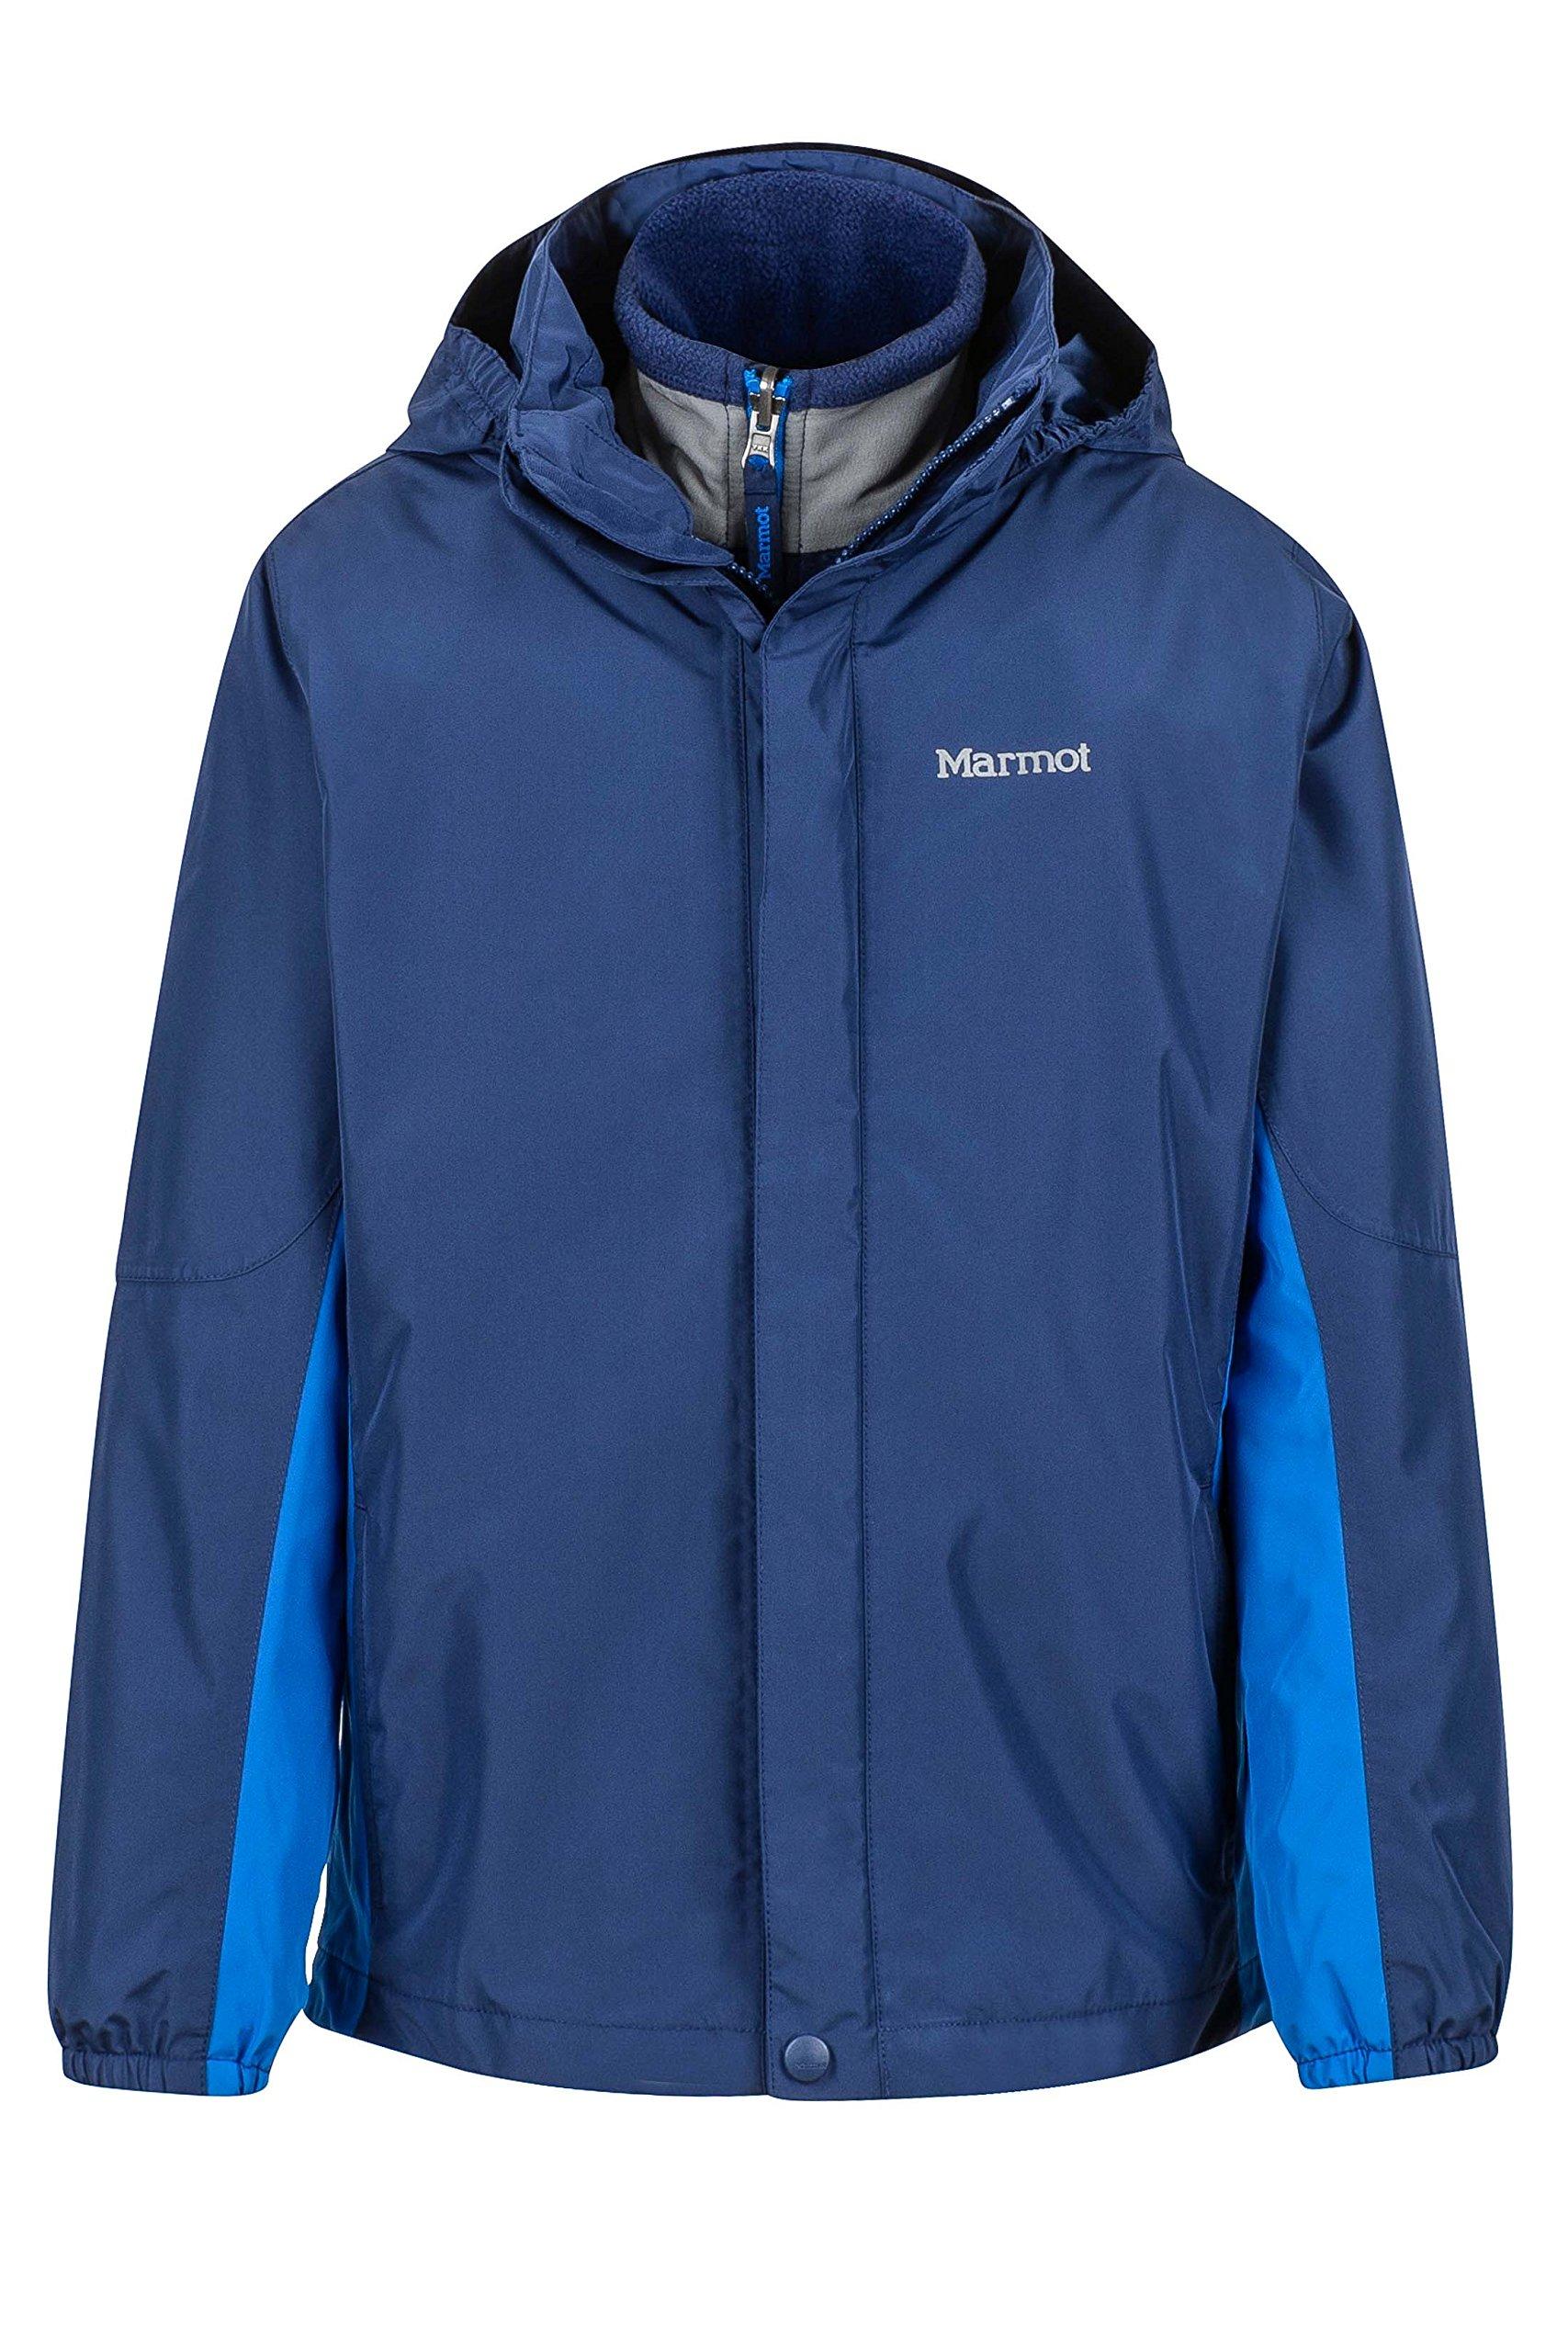 Marmot Boys' Northshore Waterproof Hooded Rain Jacket with Removable Fleece Liner, Arctic Navy/True Blue, Medium by Marmot